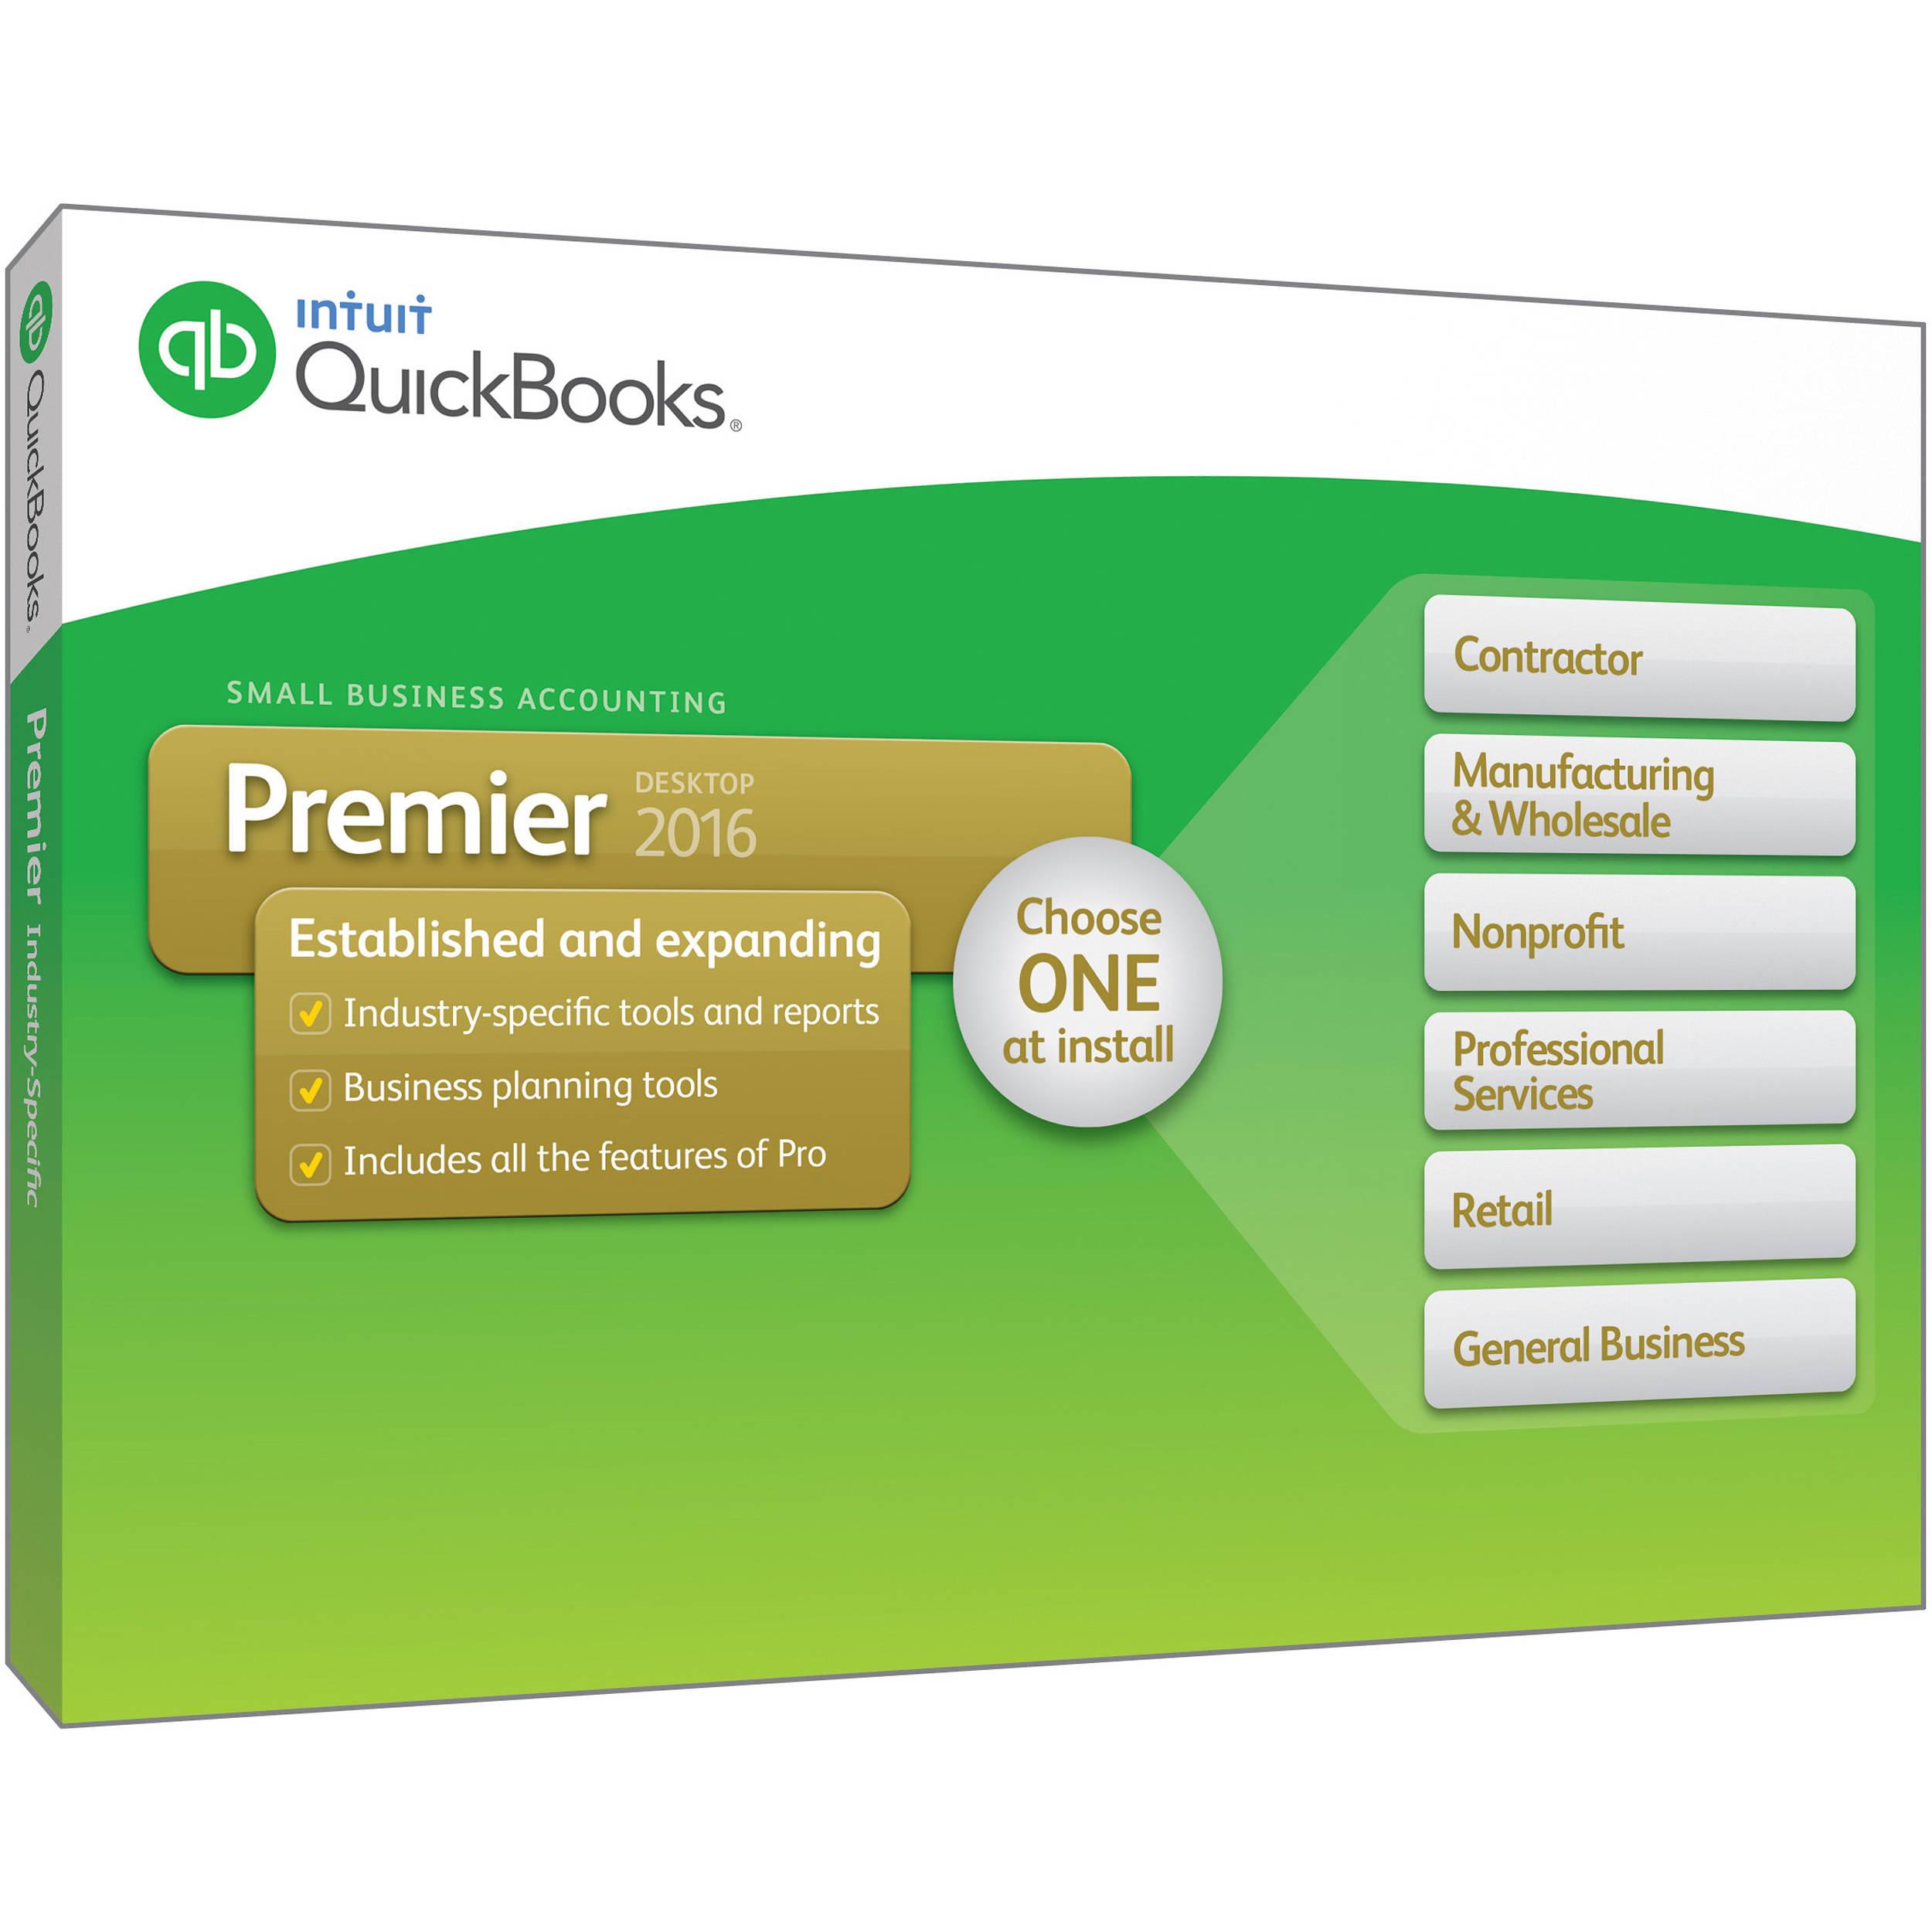 Intuit Quickbooks Premier Users